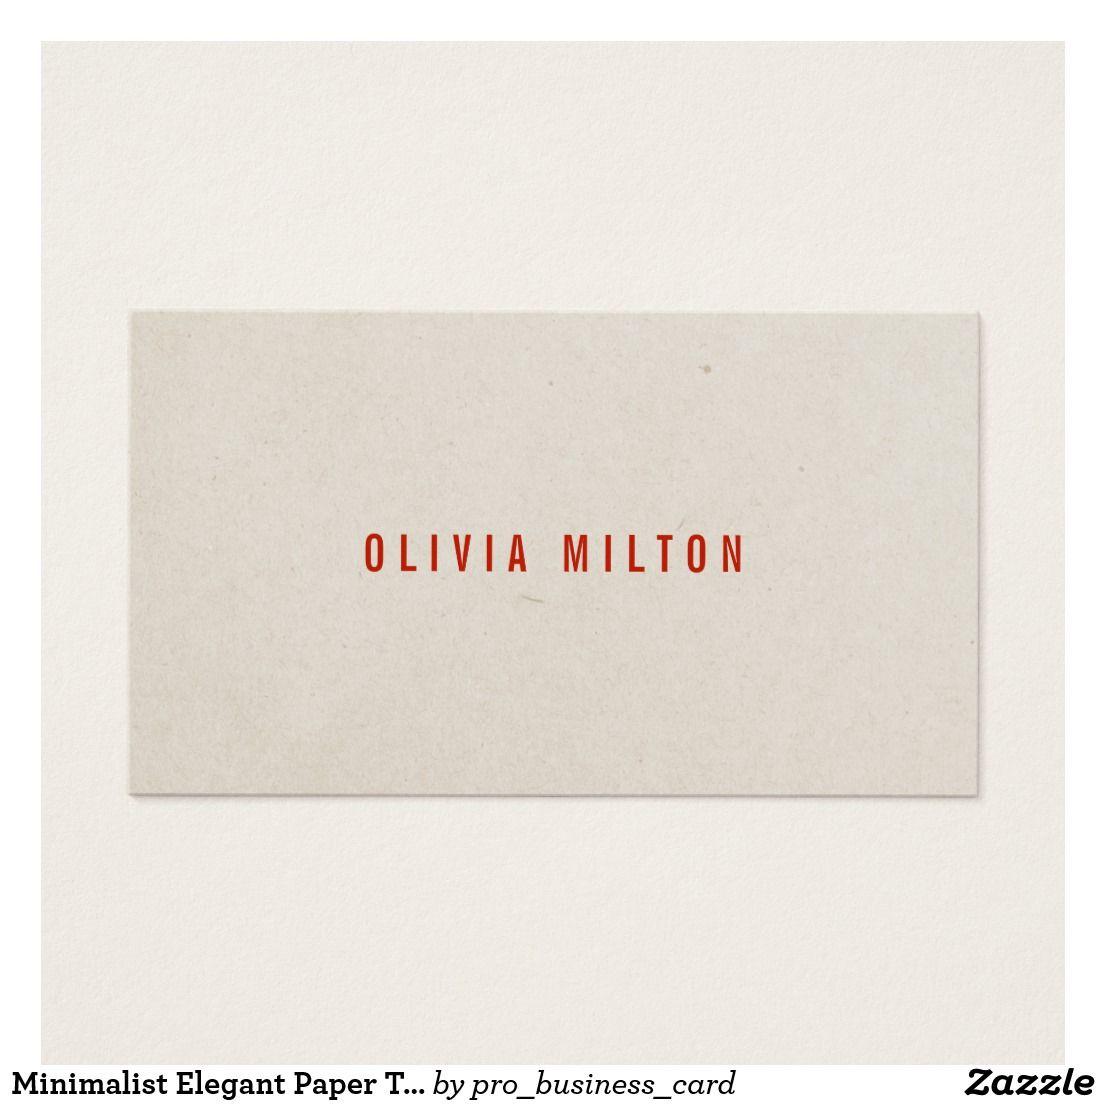 Minimalist Elegant Paper Texture Red Consultant Business Card ...